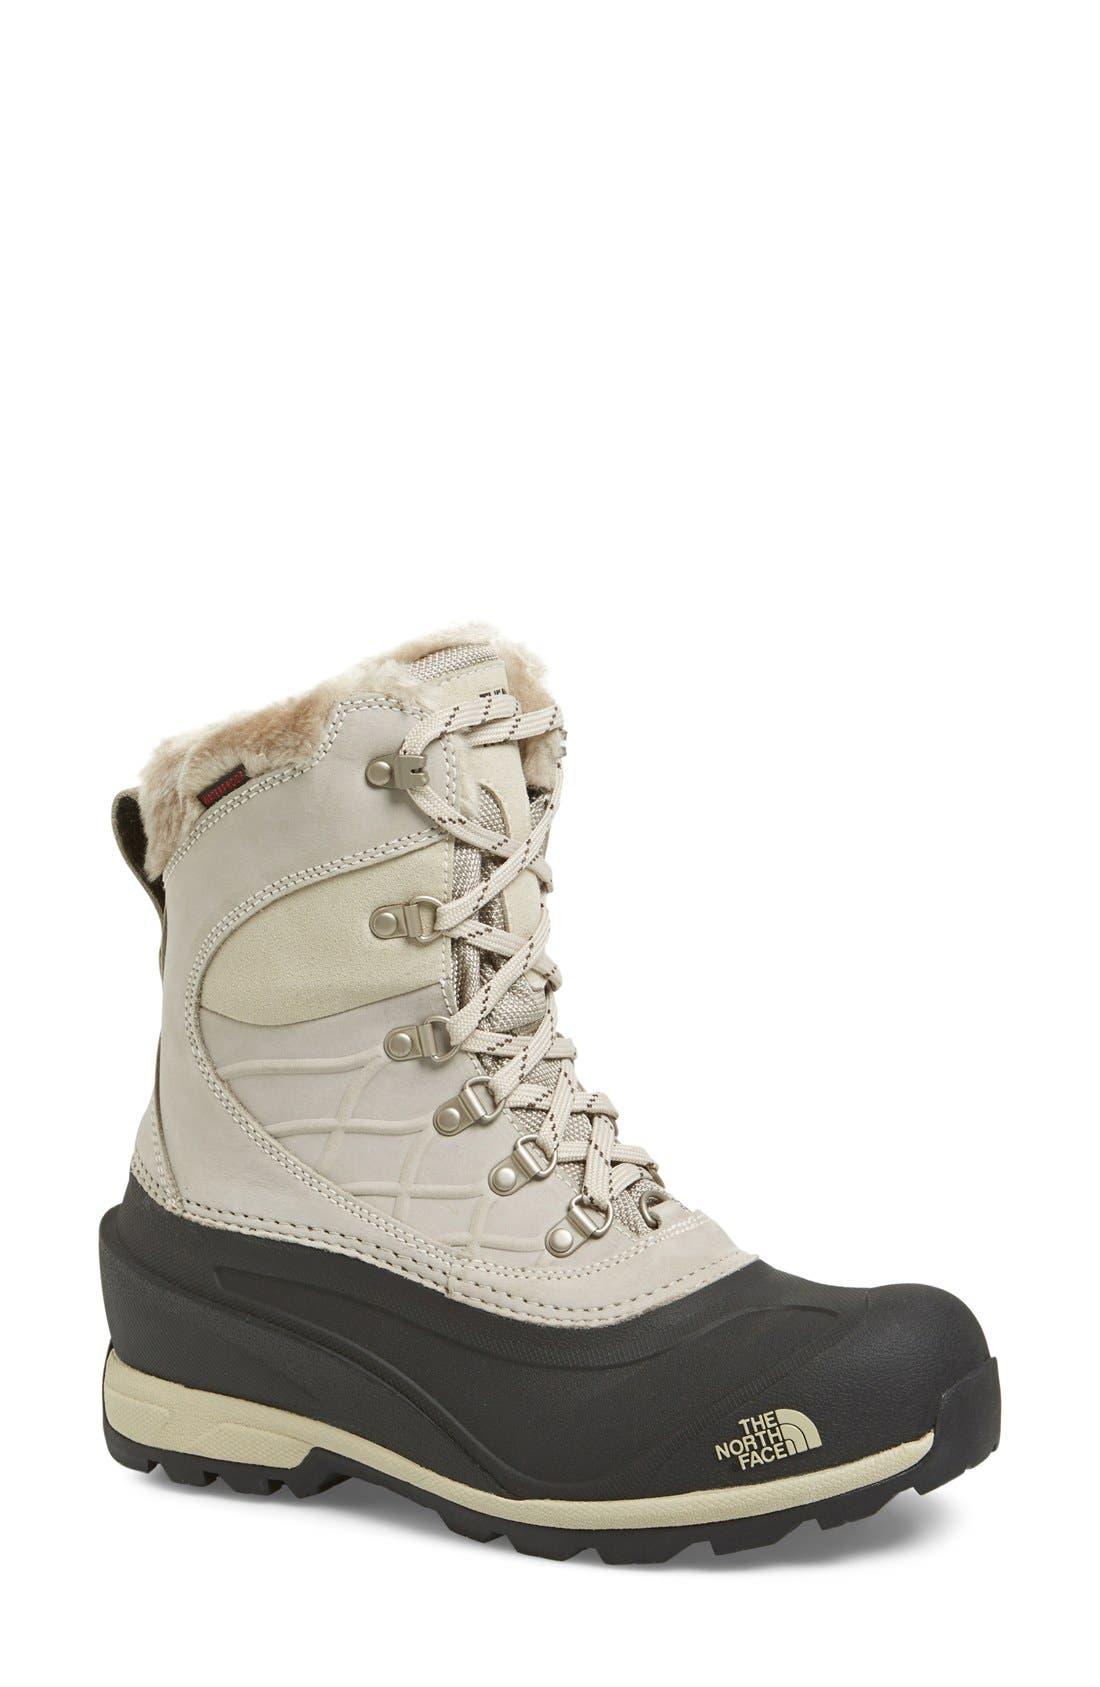 'Chilkat 400' Waterproof PrimaLoft<sup>®</sup> Insulated Boot,                             Main thumbnail 1, color,